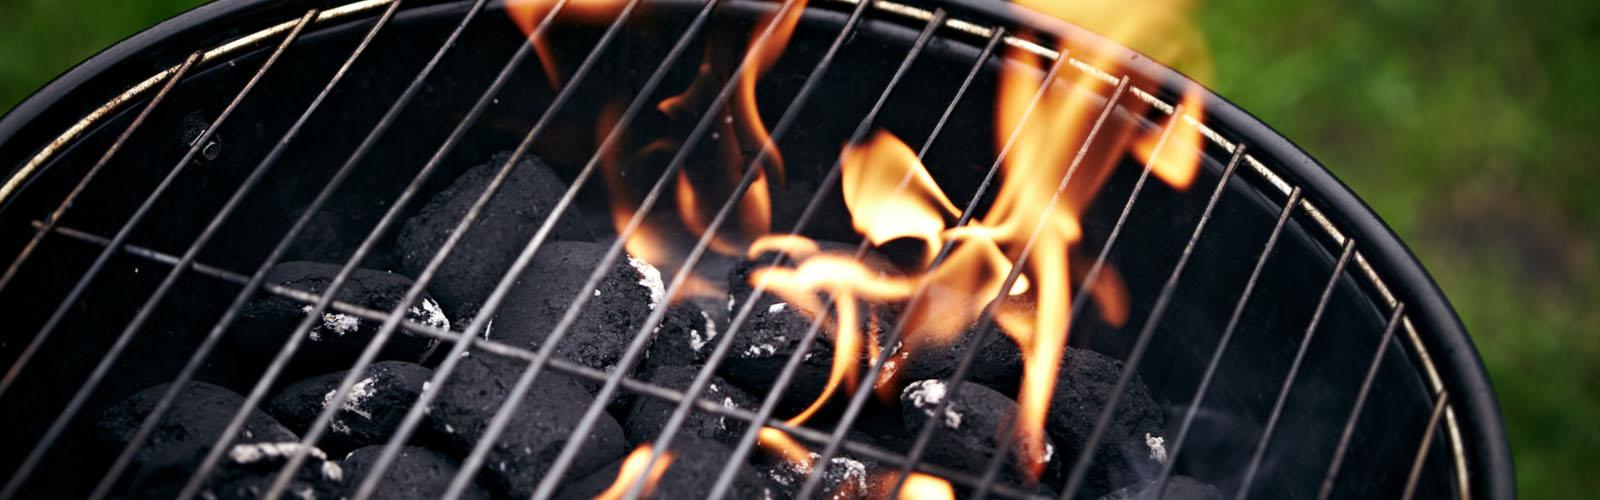 bbq grill culture barbeque